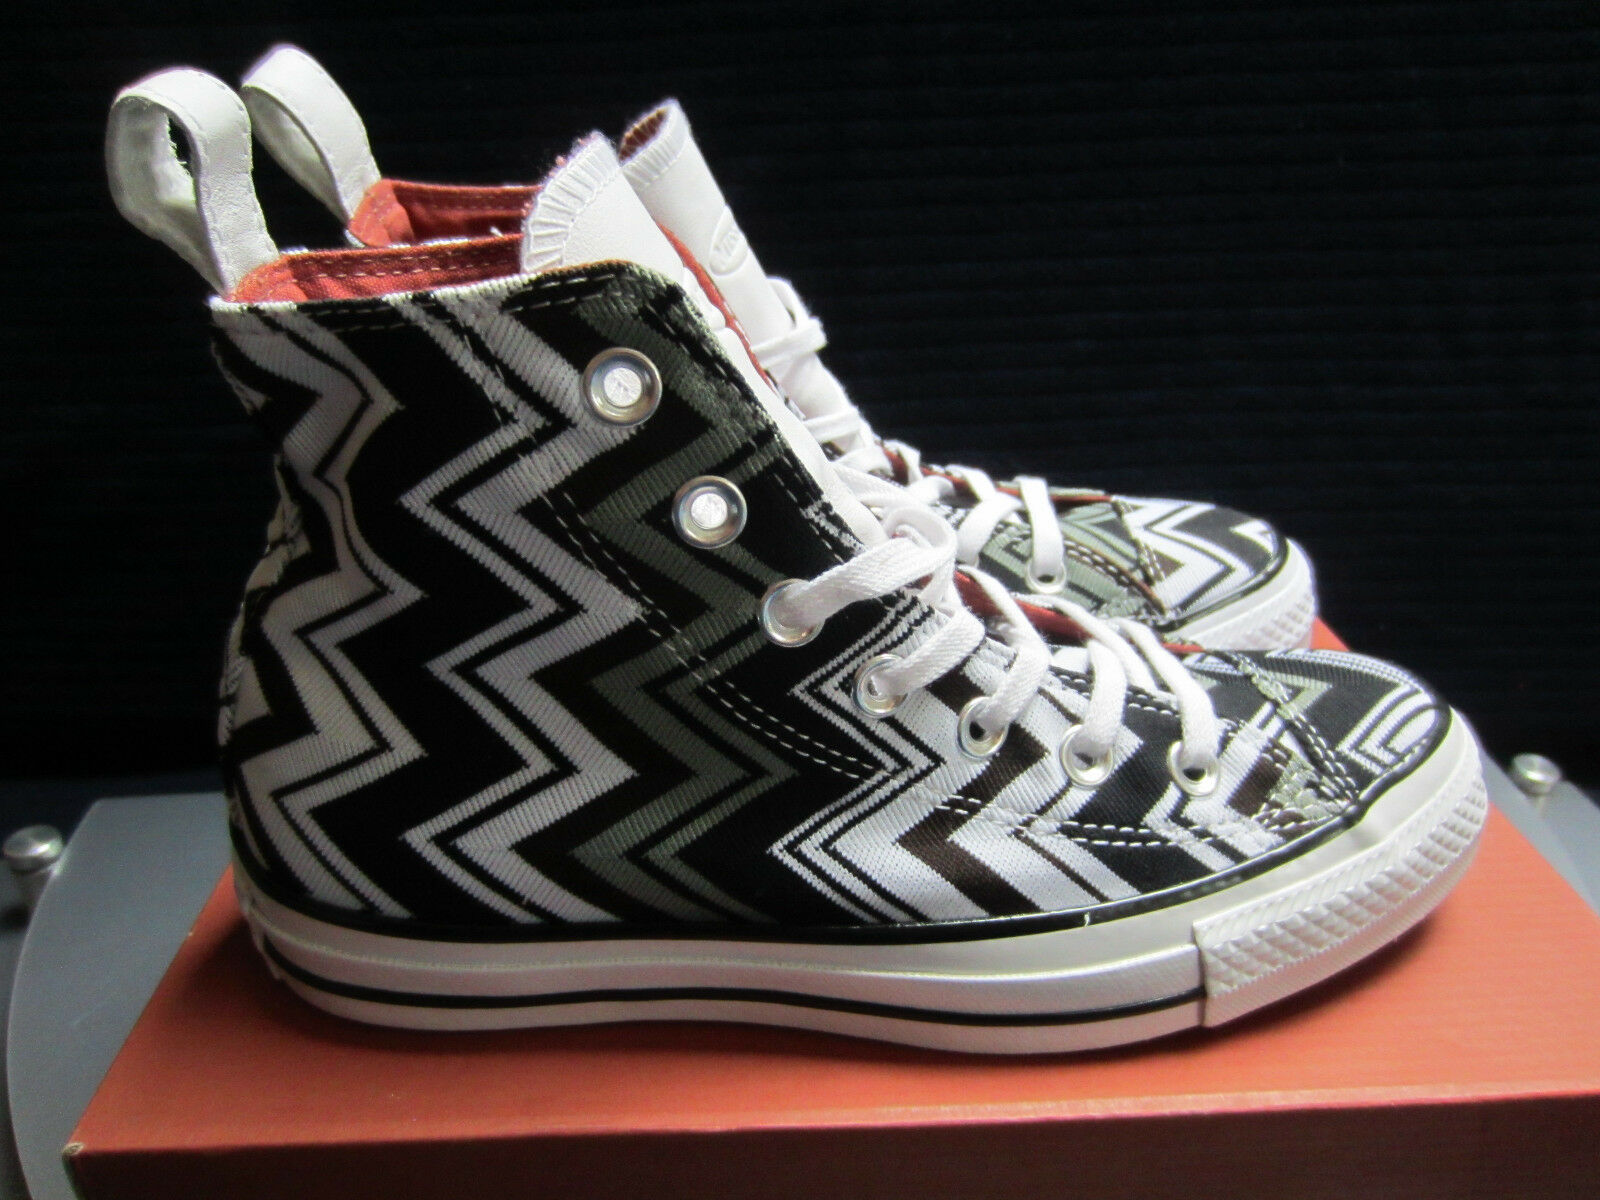 Converse CHUCK TAYLOR ALL STAR HI MISSONI 553383C Damen Damen 553383C Sneakers Gr.36,5 NEU OVP 221a13